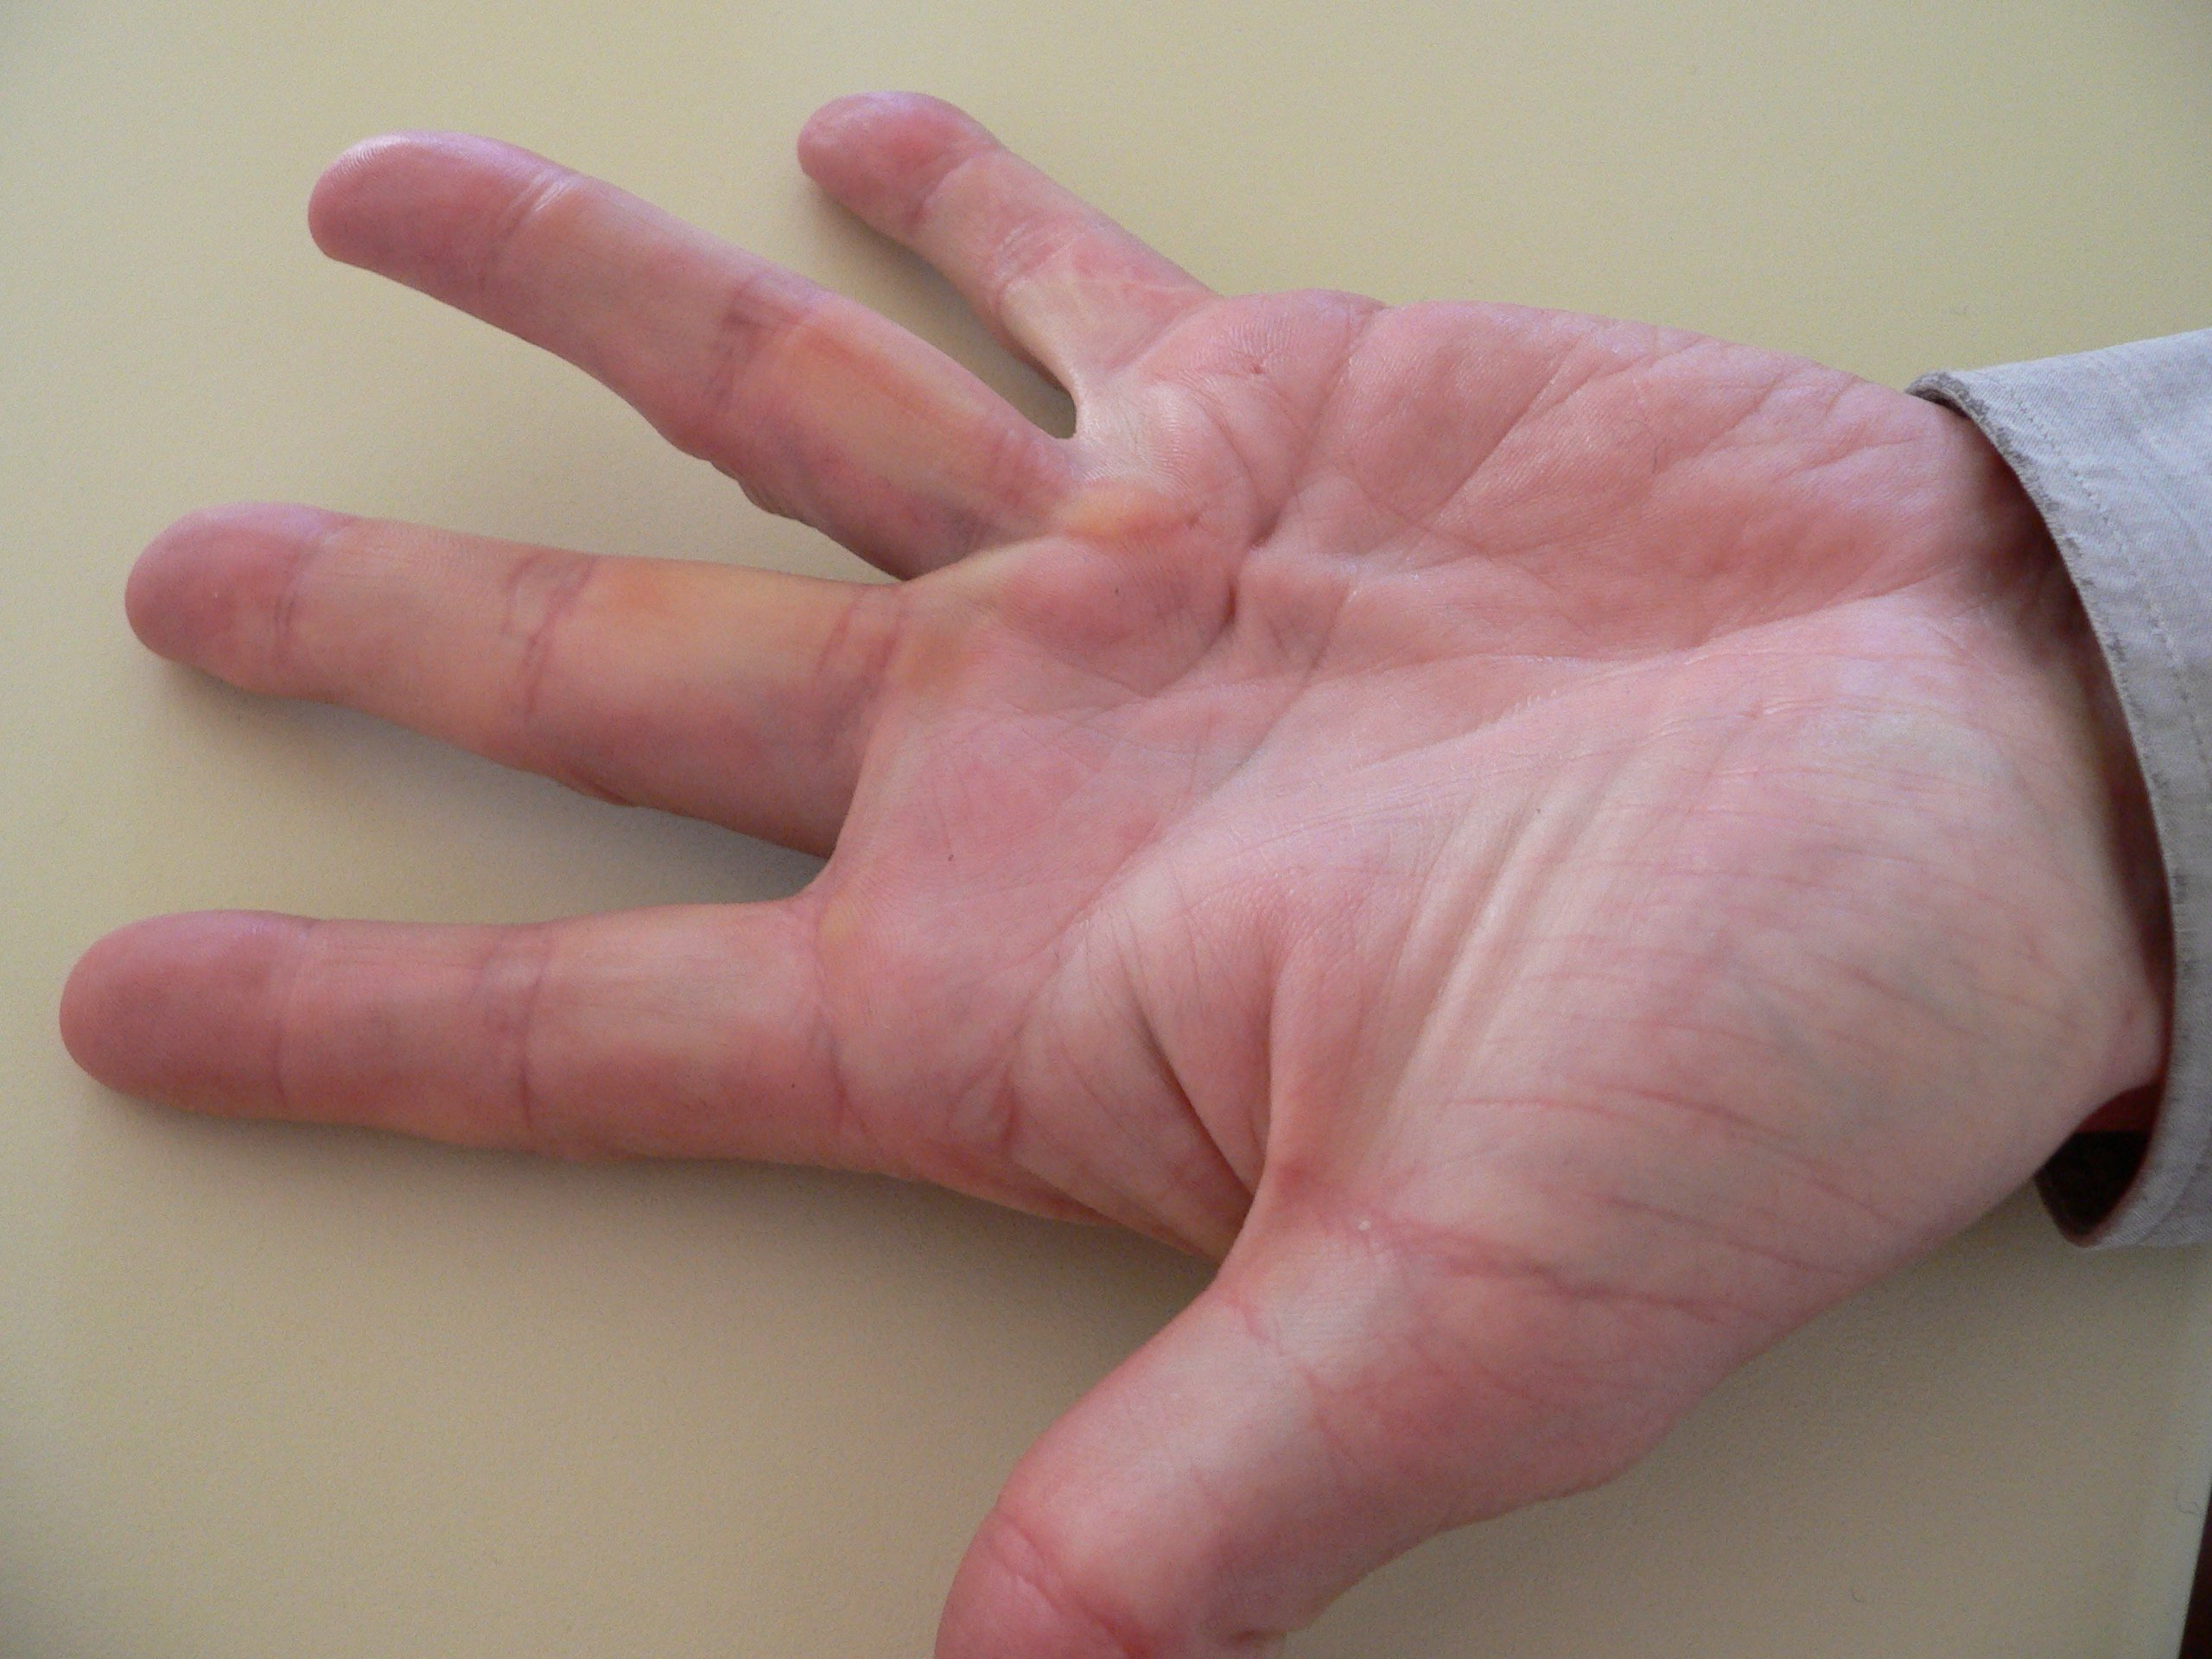 Симптомы и признаки цирроза печени у мужчин